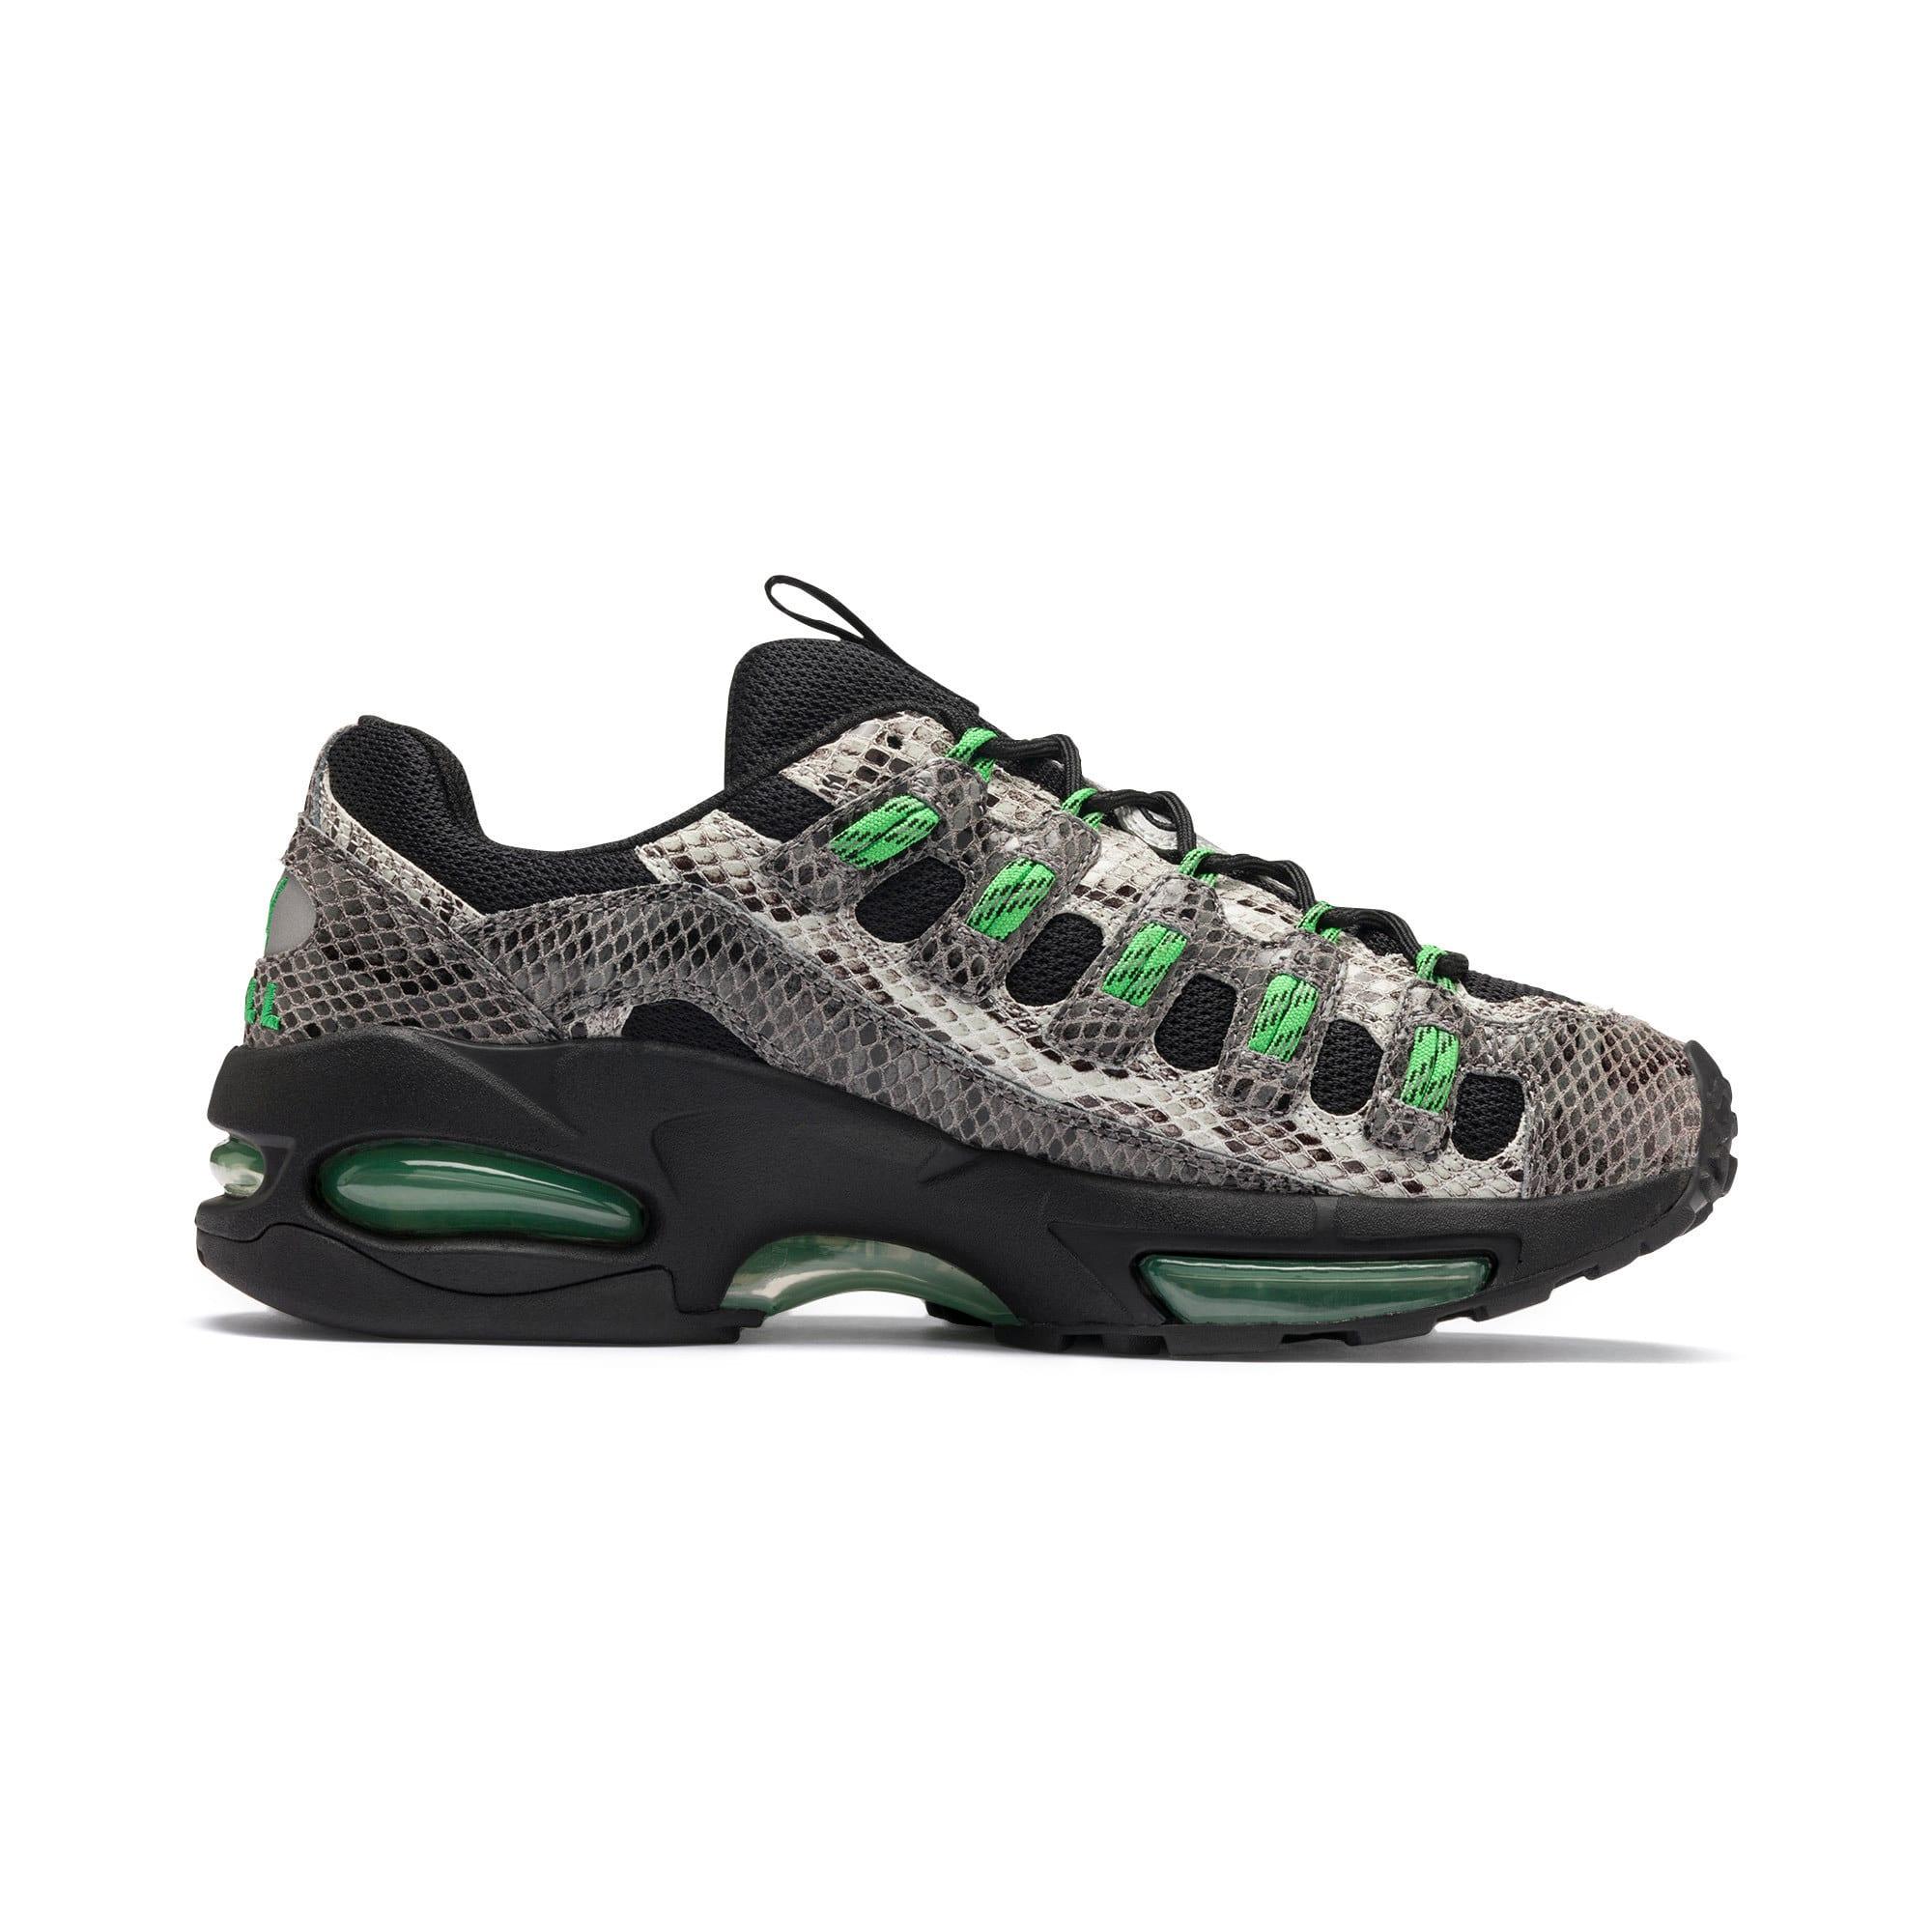 Thumbnail 6 of CELL Endura Animal Kingdom Sneakers, Puma Black-Classic Green, medium